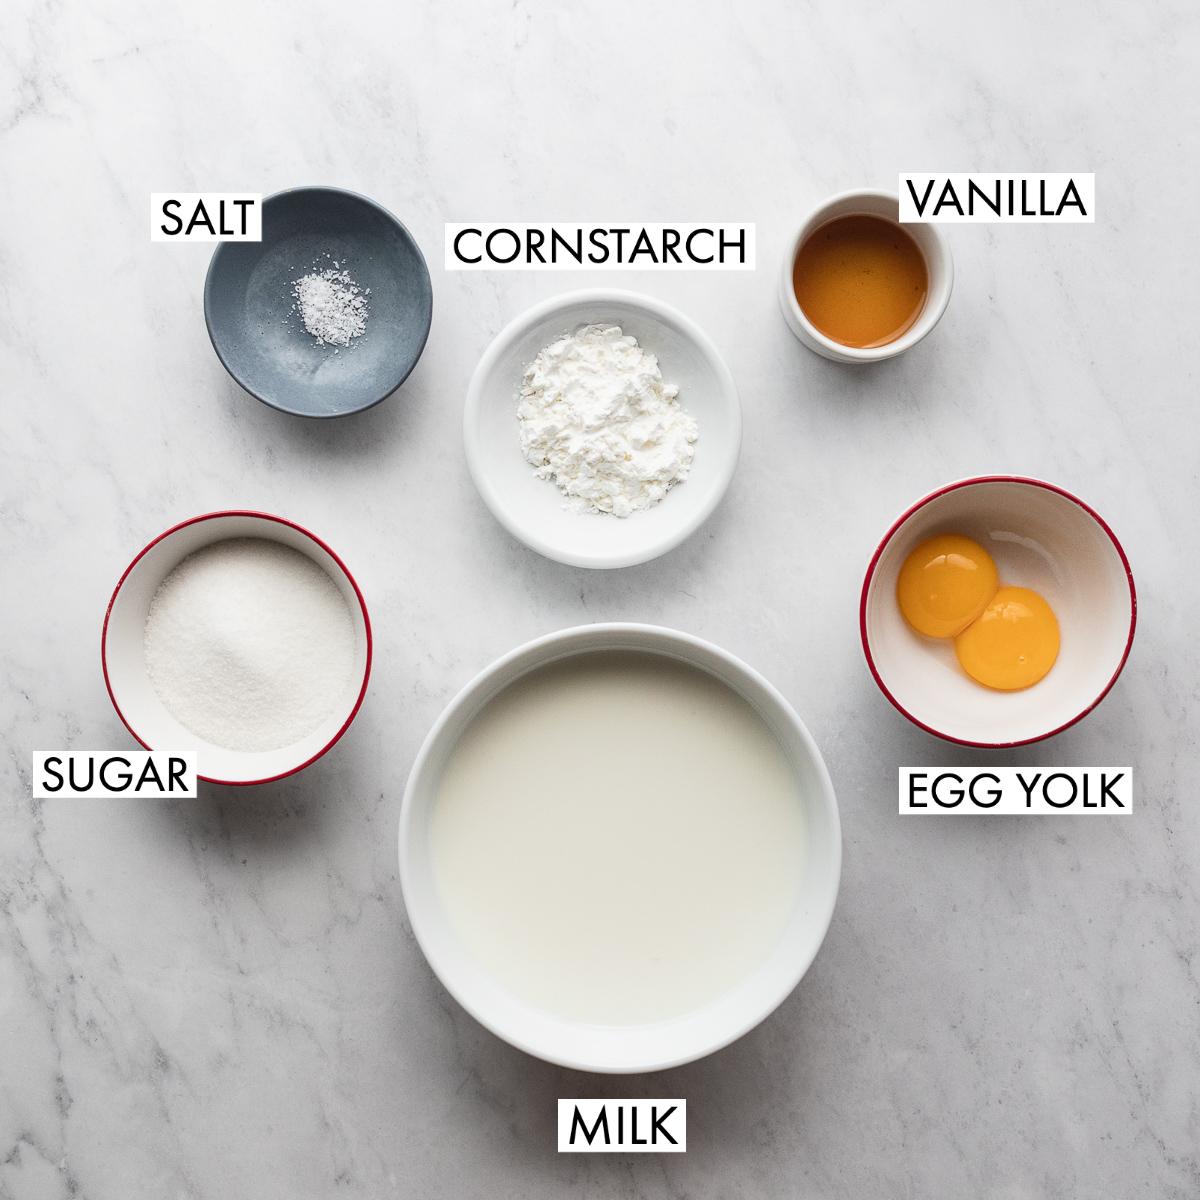 ingredients for vanilla pastry cream